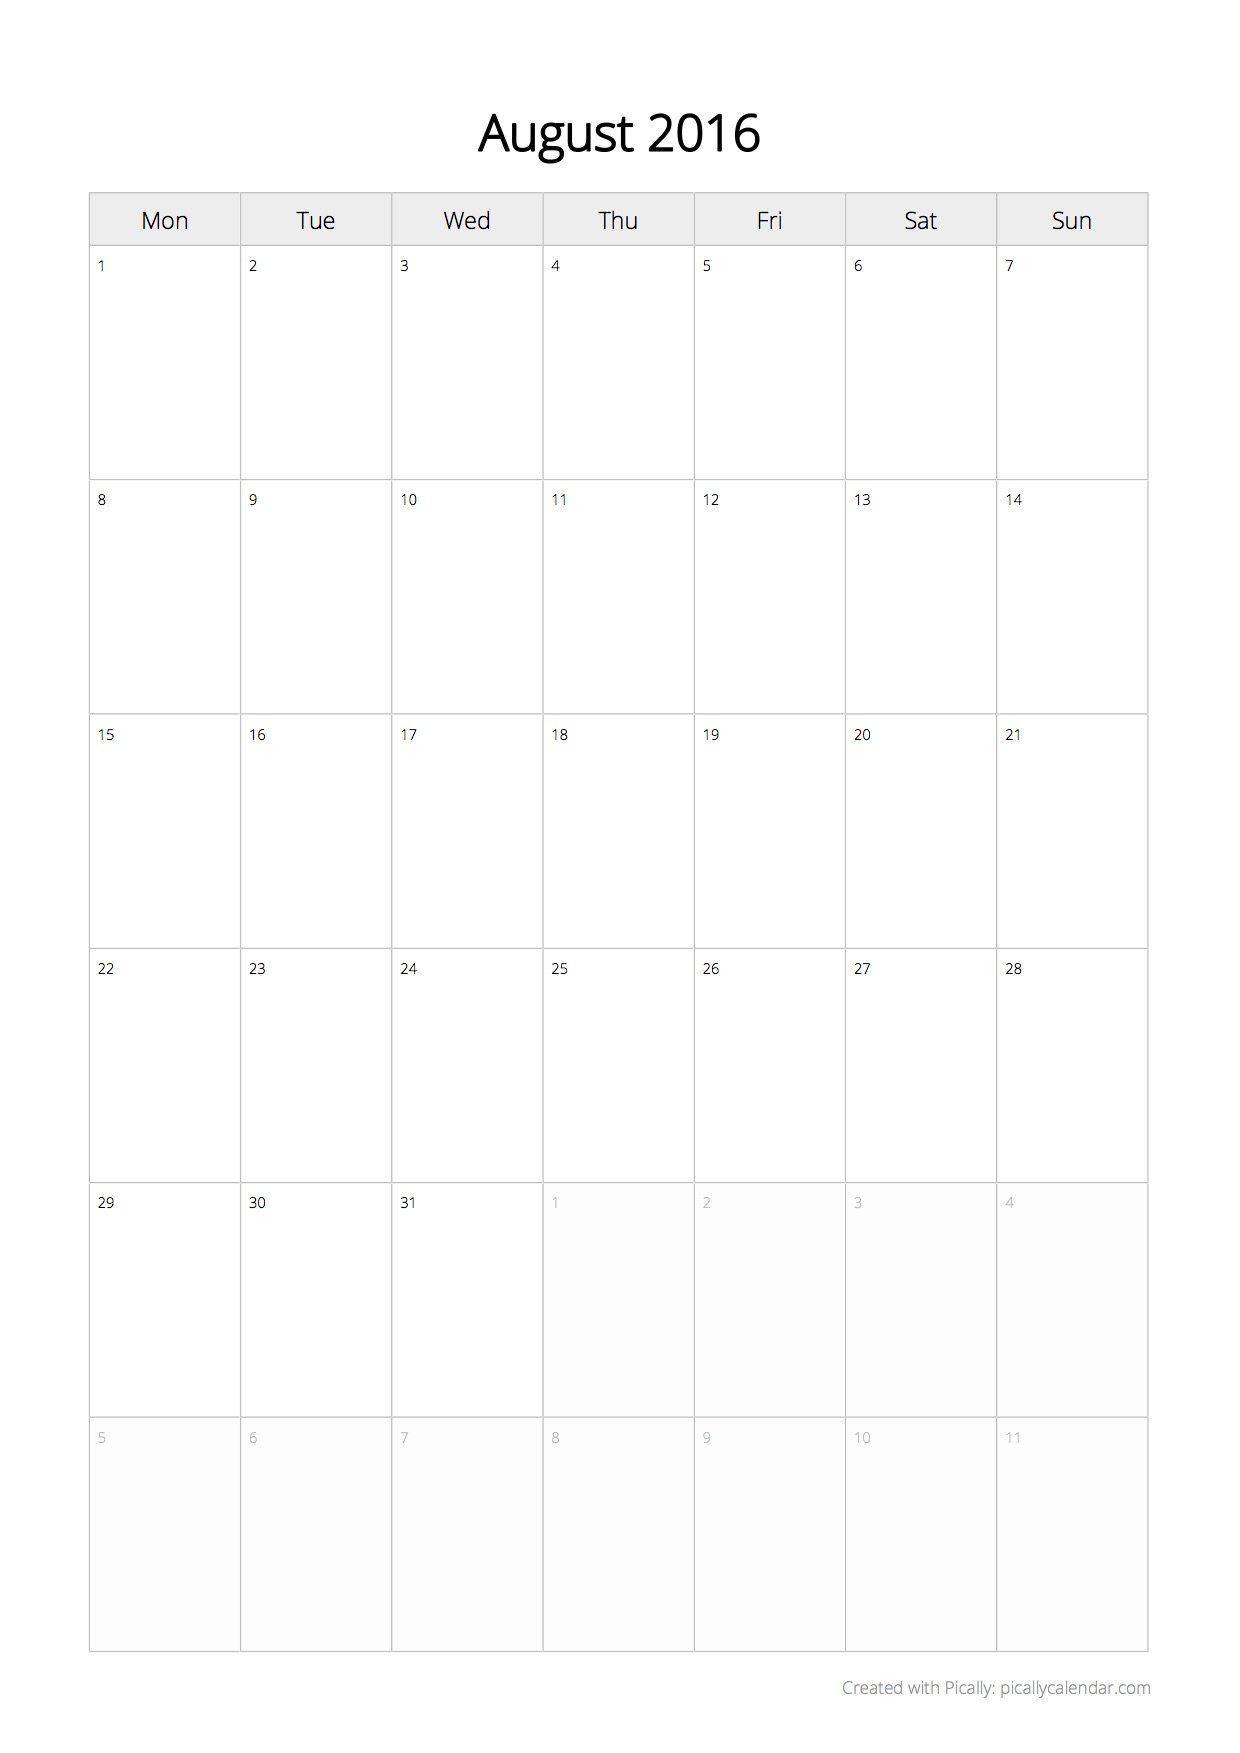 Create Free Photo Calendar 2019 And 2020 – Picallycalendar Calendar 2019 Create